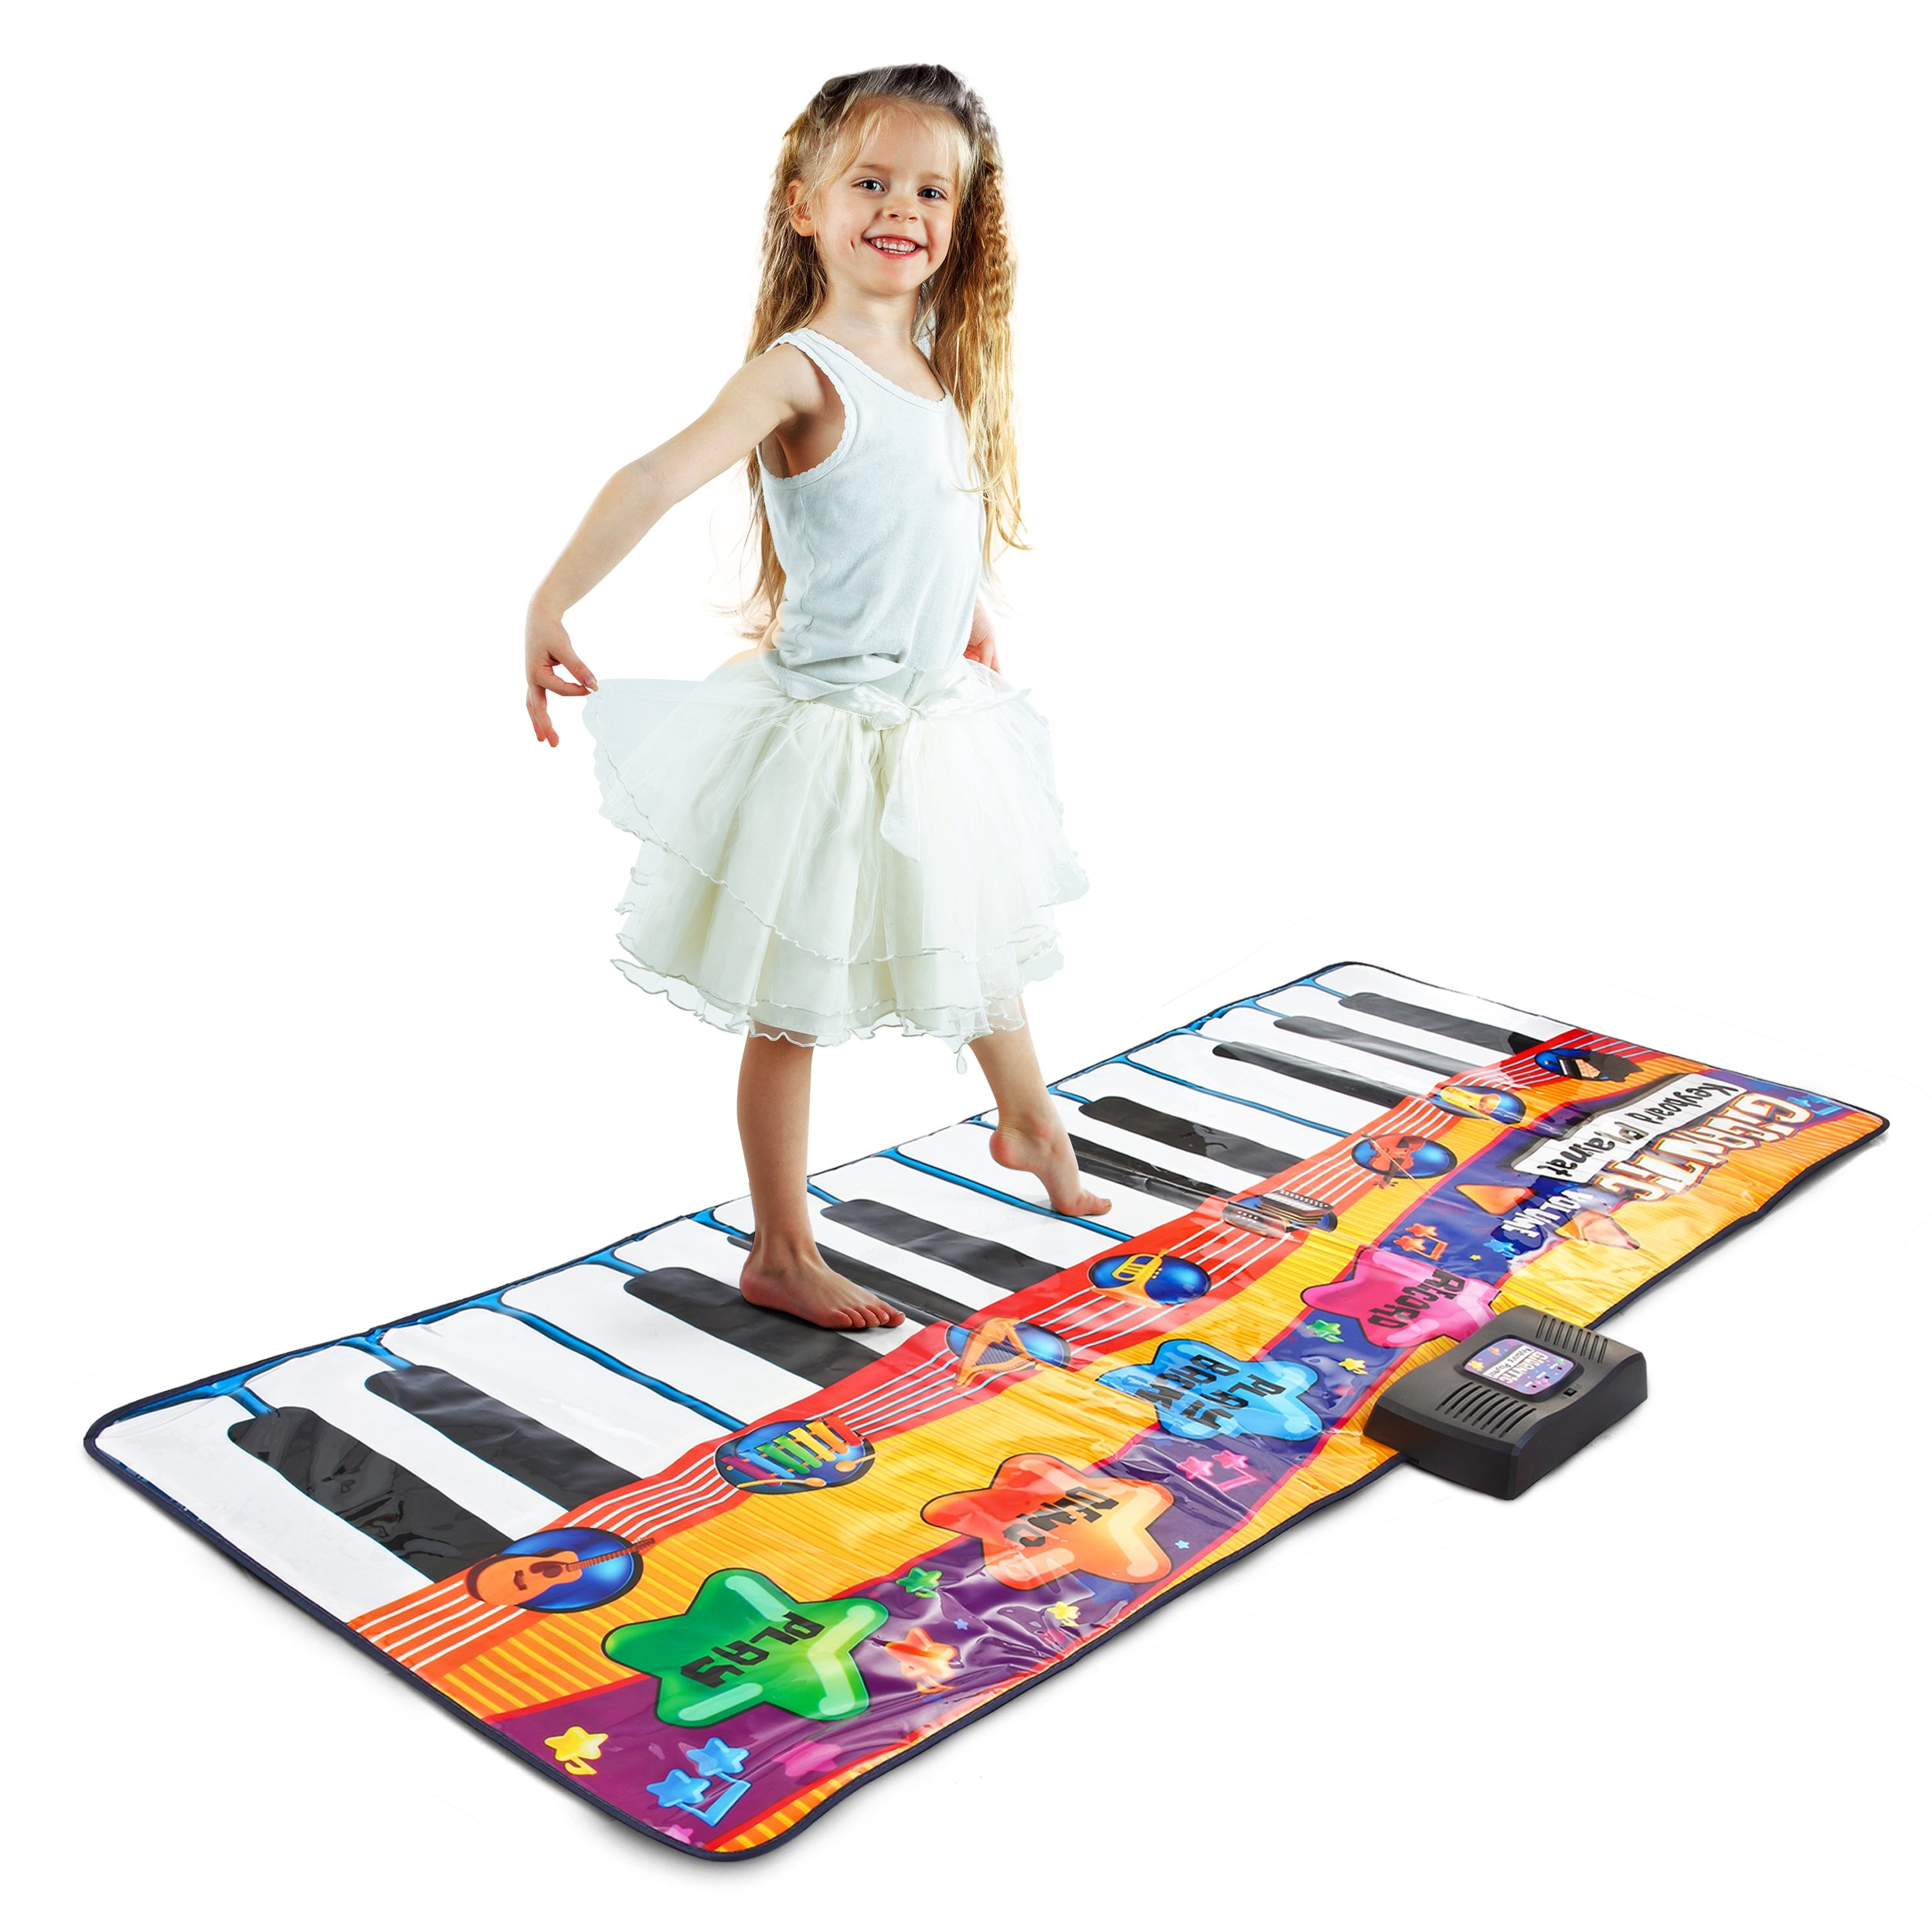 Joyin Toy 71'' Gigantic Keyboard Playmat Piano Play Mat Kids Electronic Music Playmat Colorful Dance Mat-24 Keys with Record, Playback, Demo, Play, Adjustable Vol. Mode